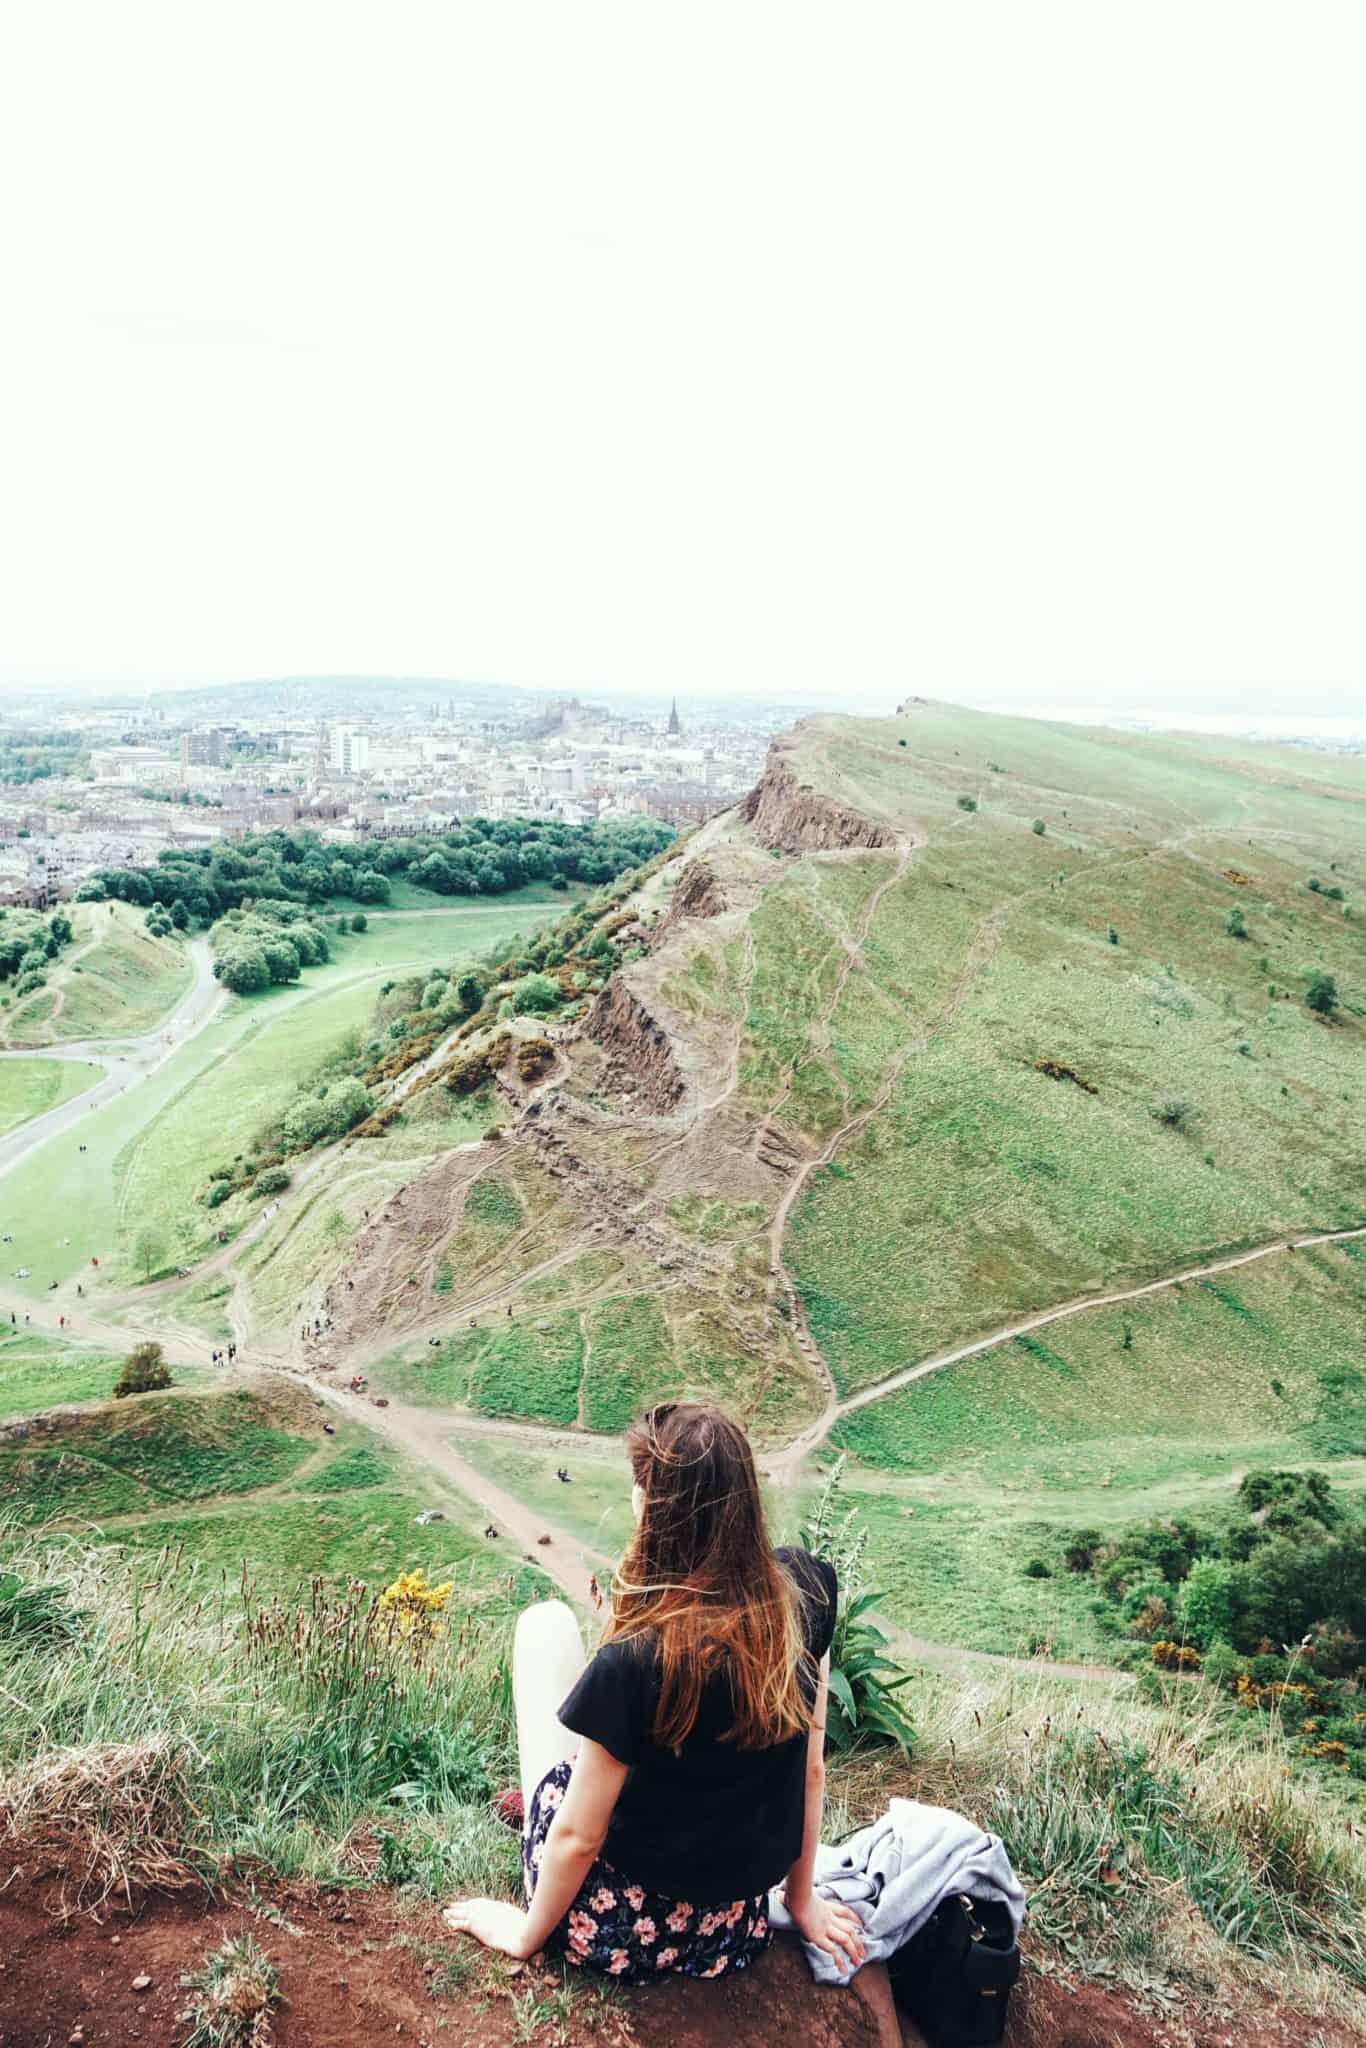 Hiking Arthur's Seat Climbing an Extinct Volcano in Edinburgh, Scotland